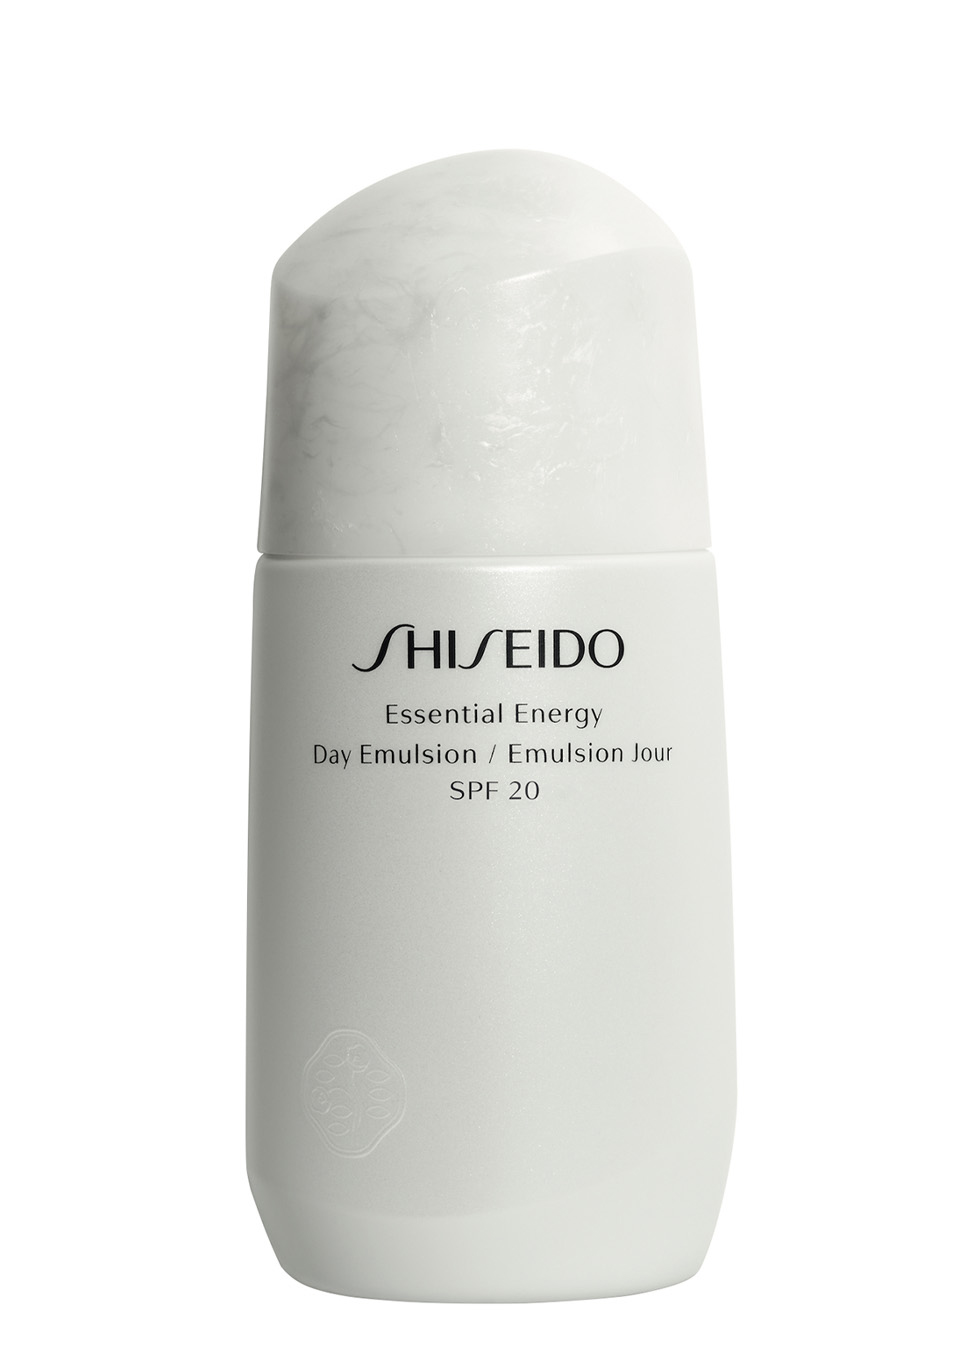 Shiseido Essenzial Energy Day Emulsion Spf 20